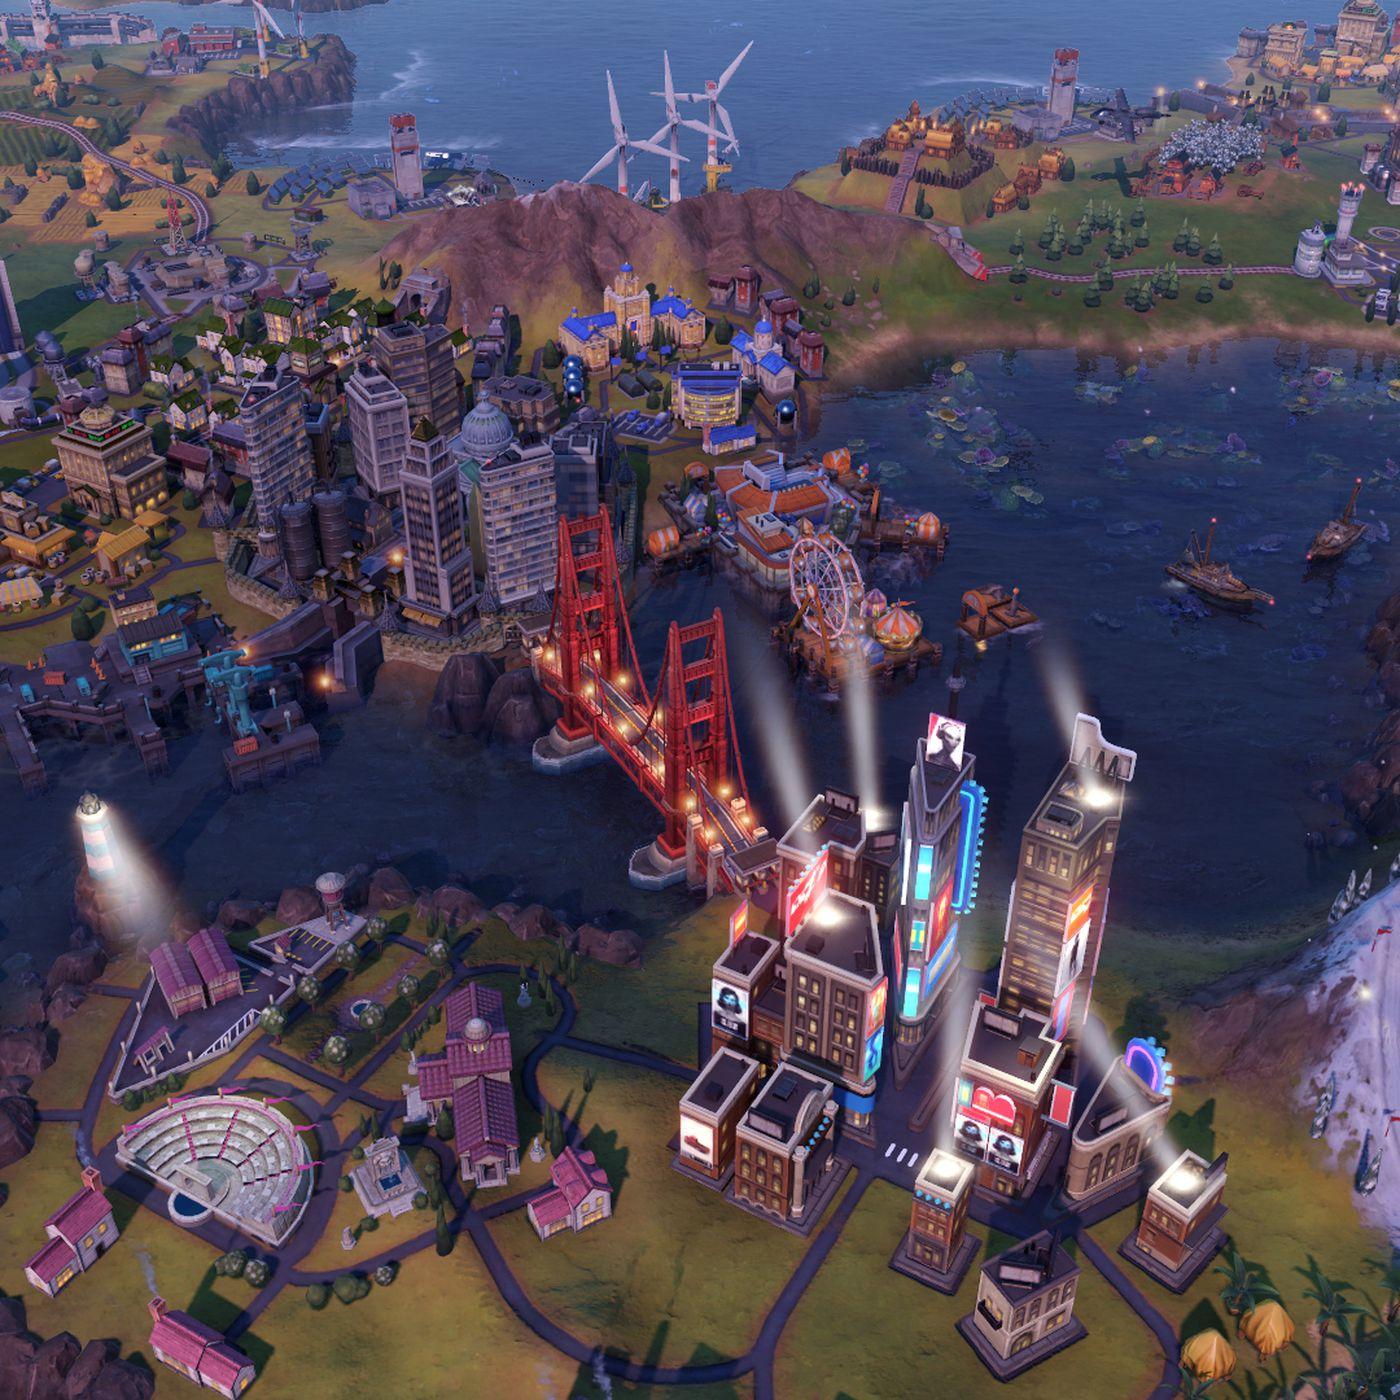 Civilization 6 expansion Gathering Storm will address